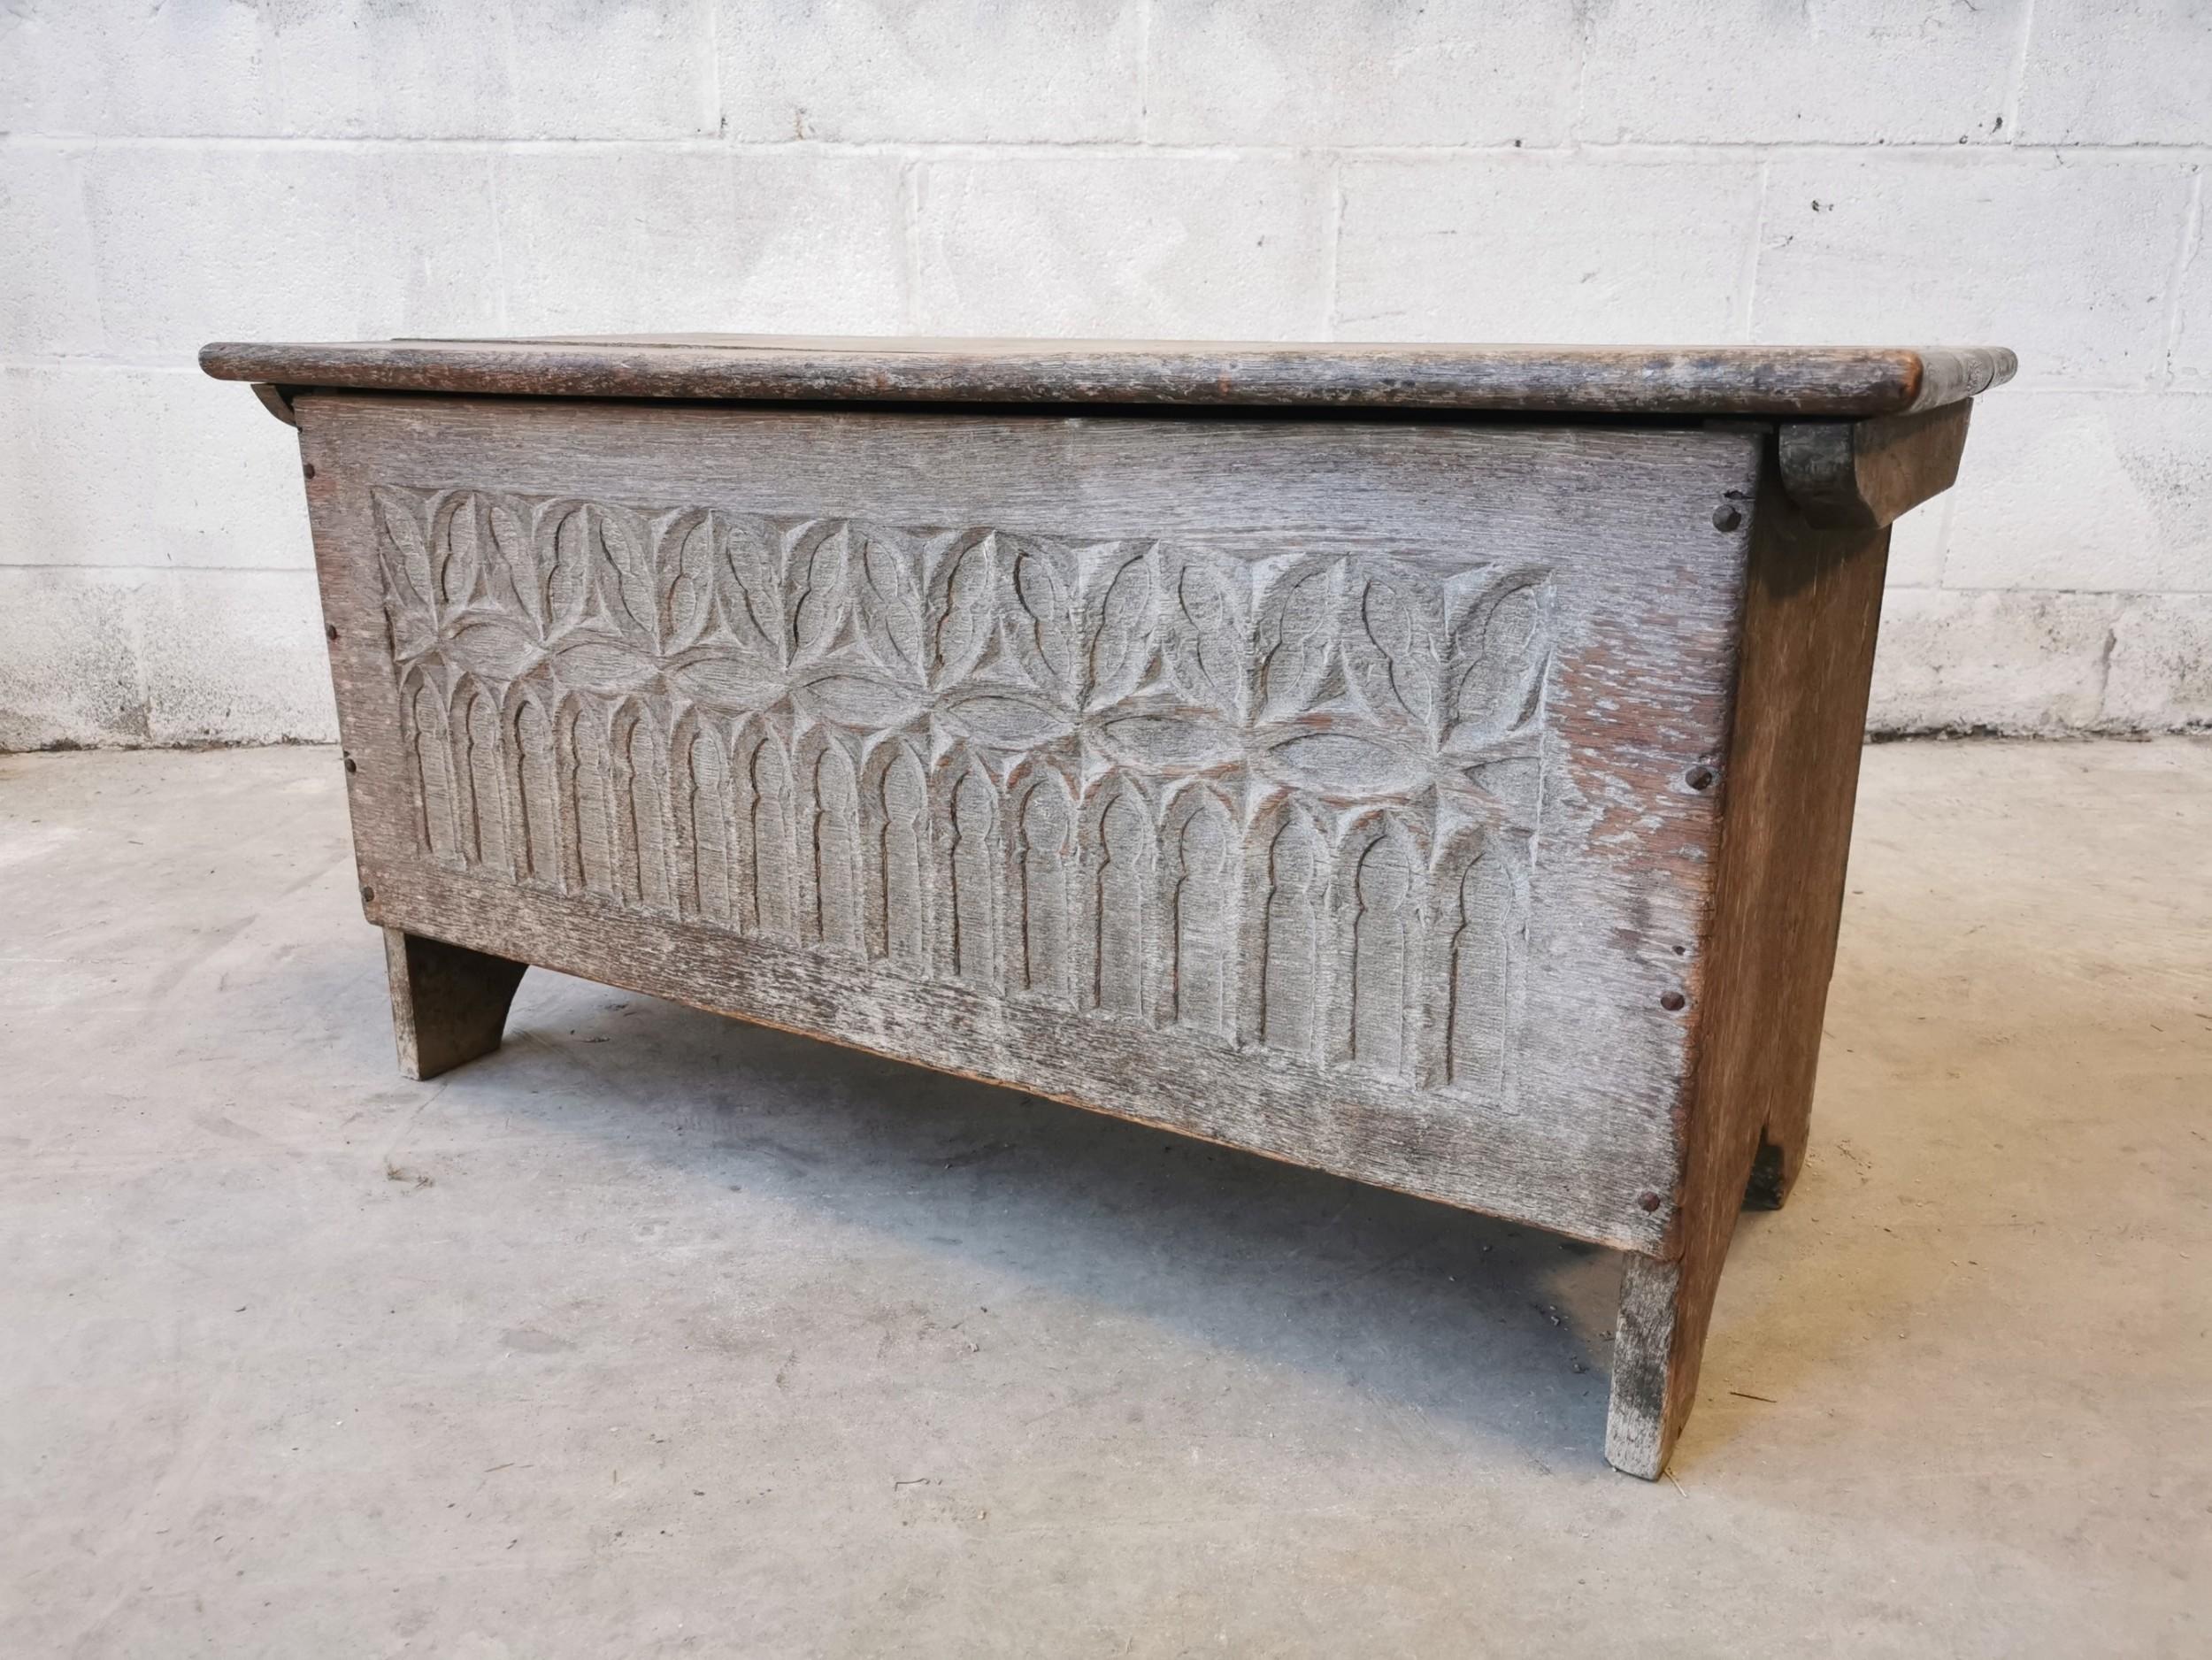 antique distressed linenfold kist blanket chest box